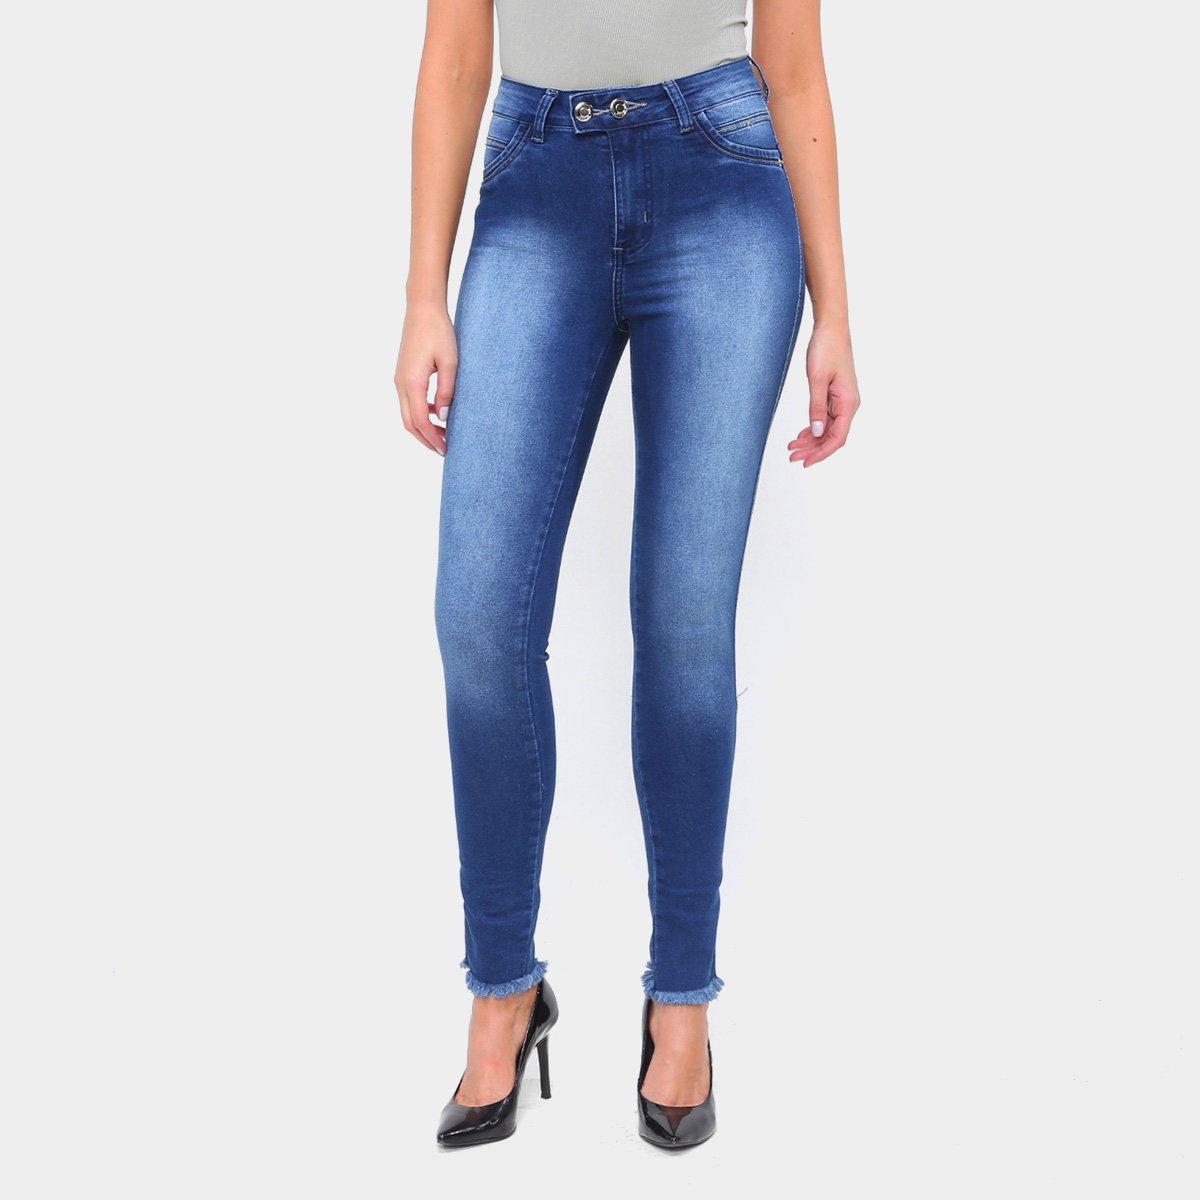 Calça Jeans Skinny TKS Barra Desfiada Feminina